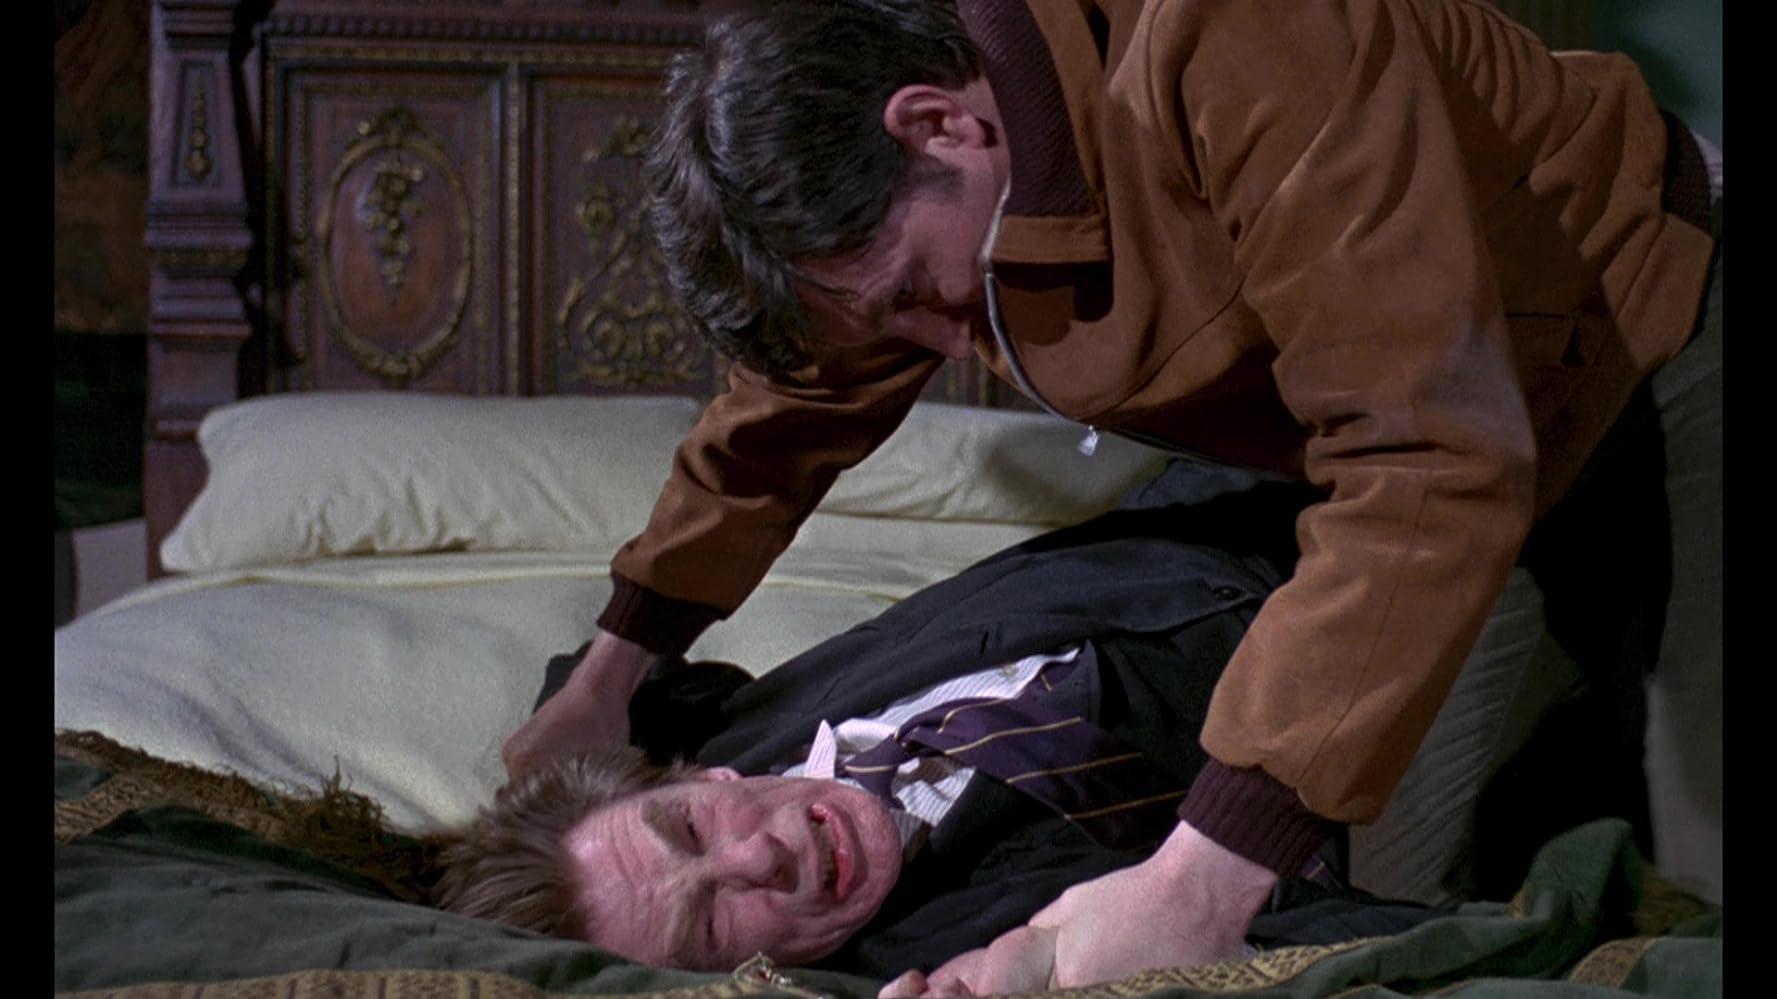 Michael Gough and Mark Eden in Curse of the Crimson Altar (1968)